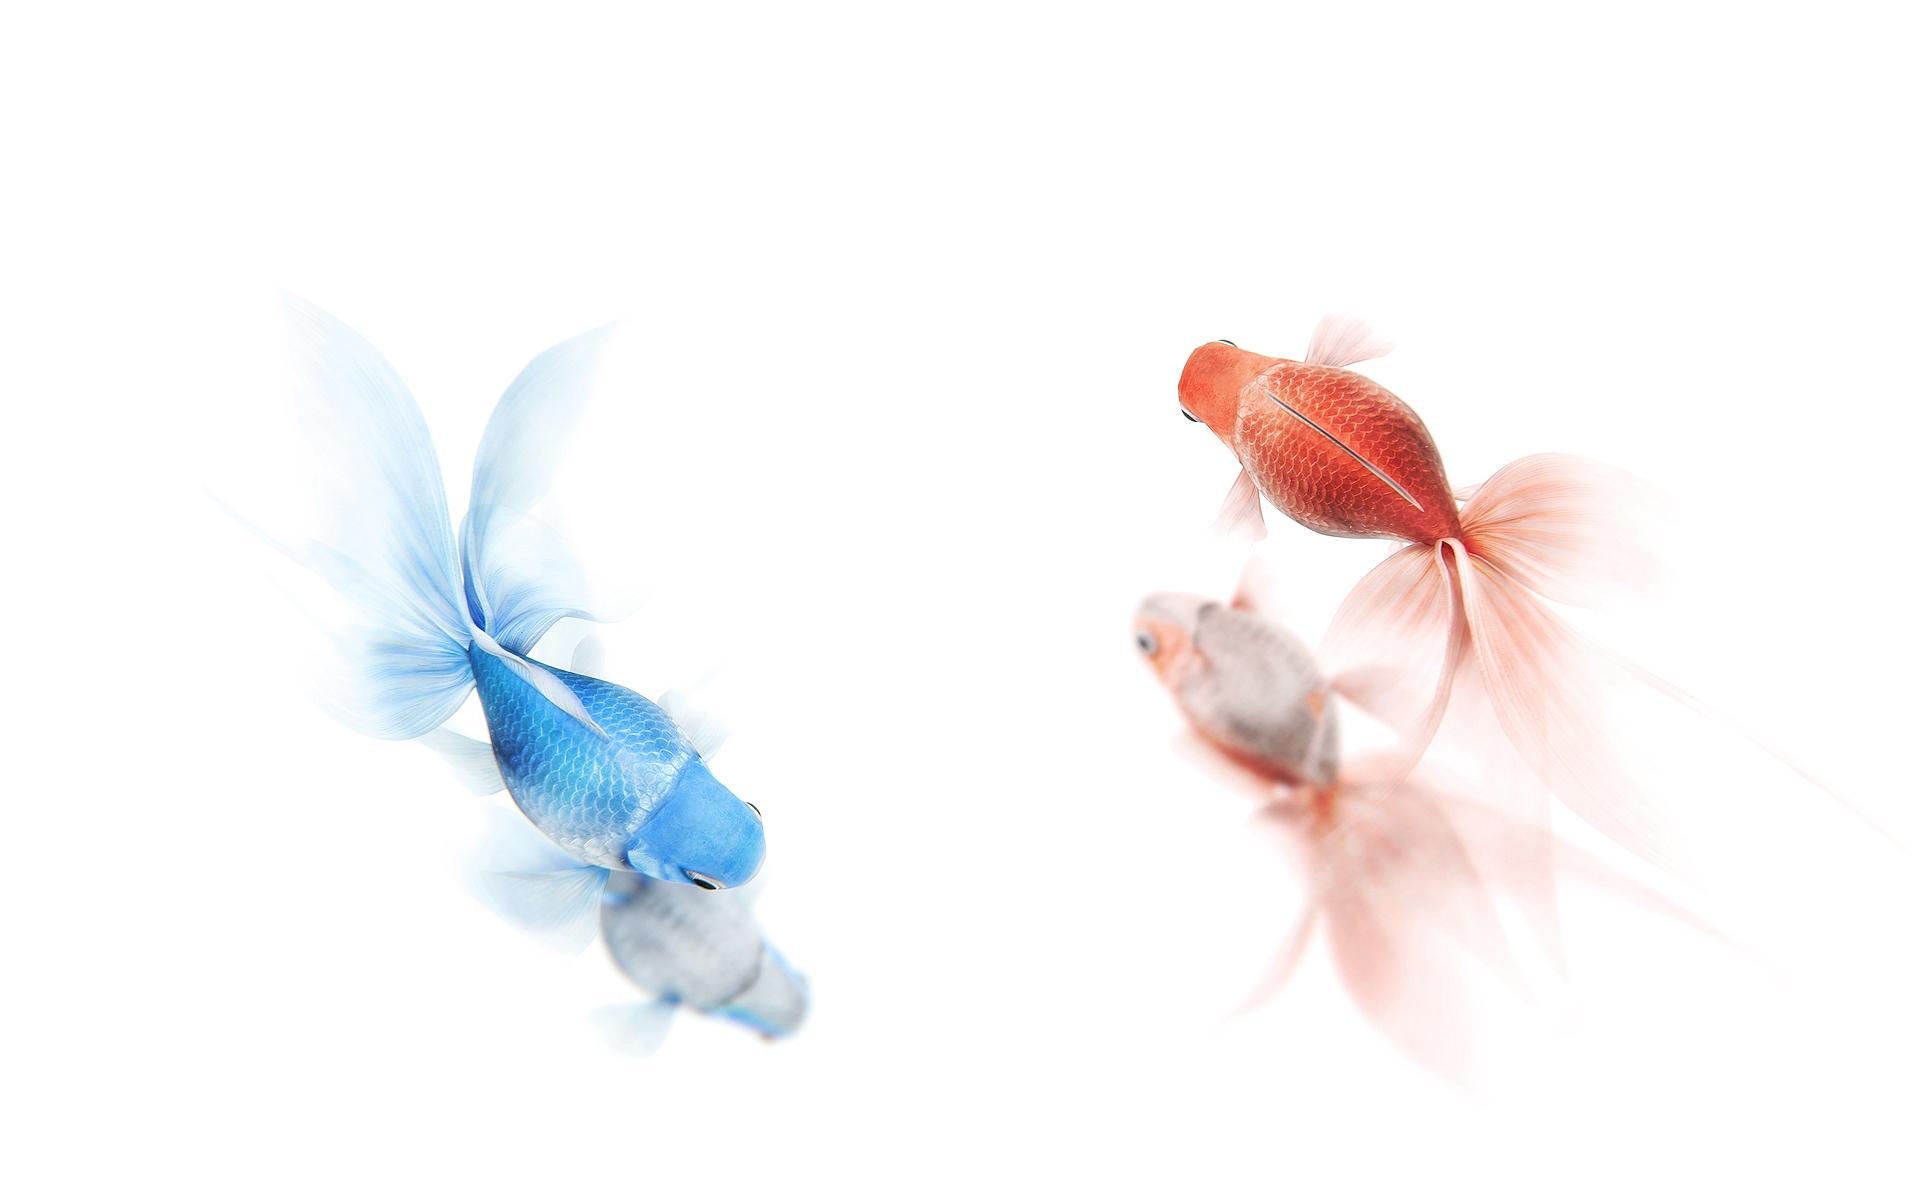 Goldfish Wallpapers HD Download 1920x1200